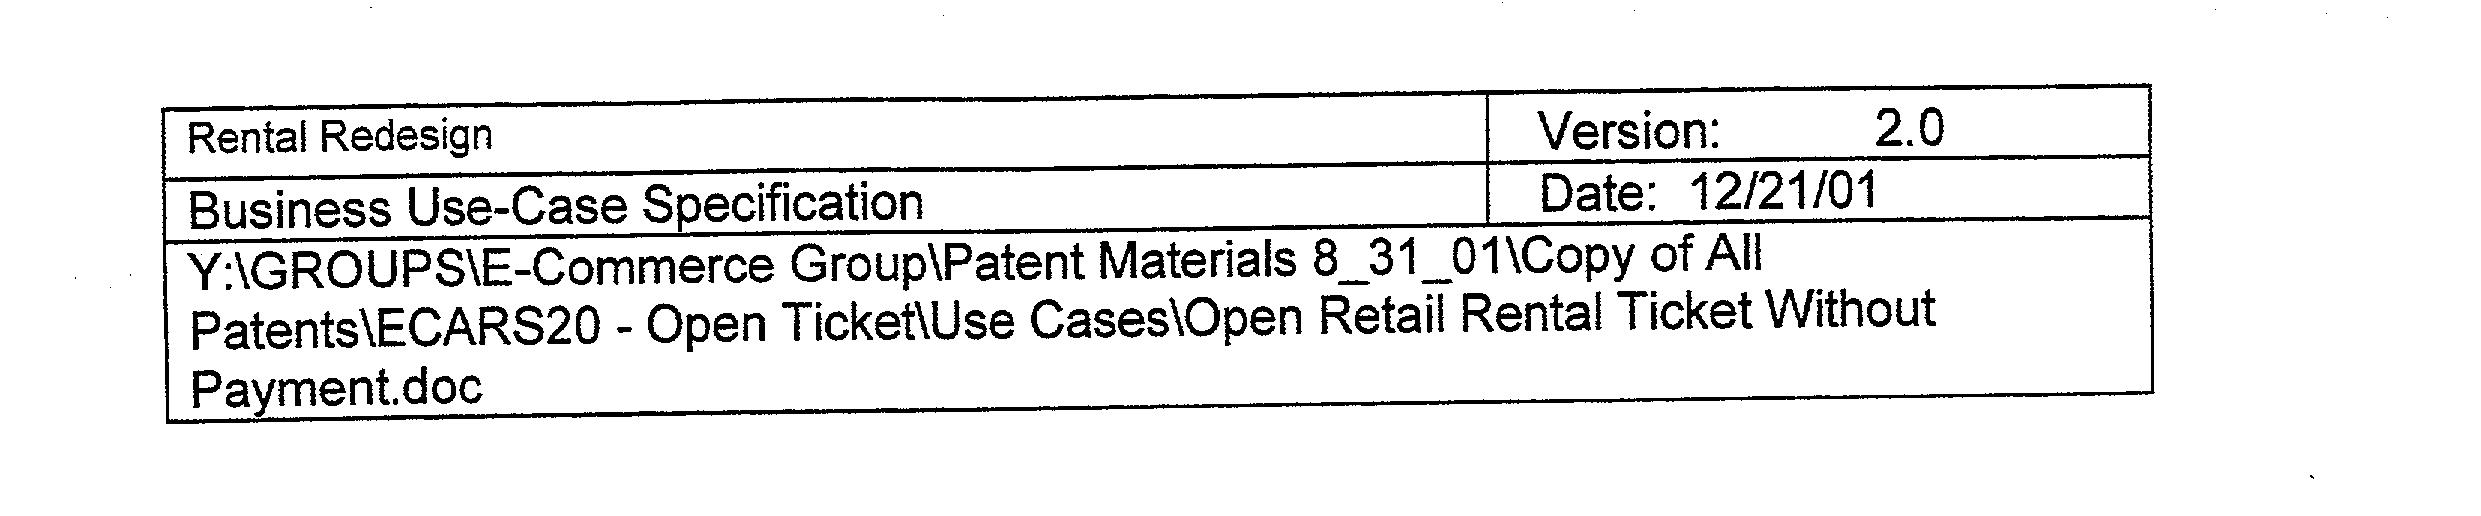 Figure US20030125992A1-20030703-P01597